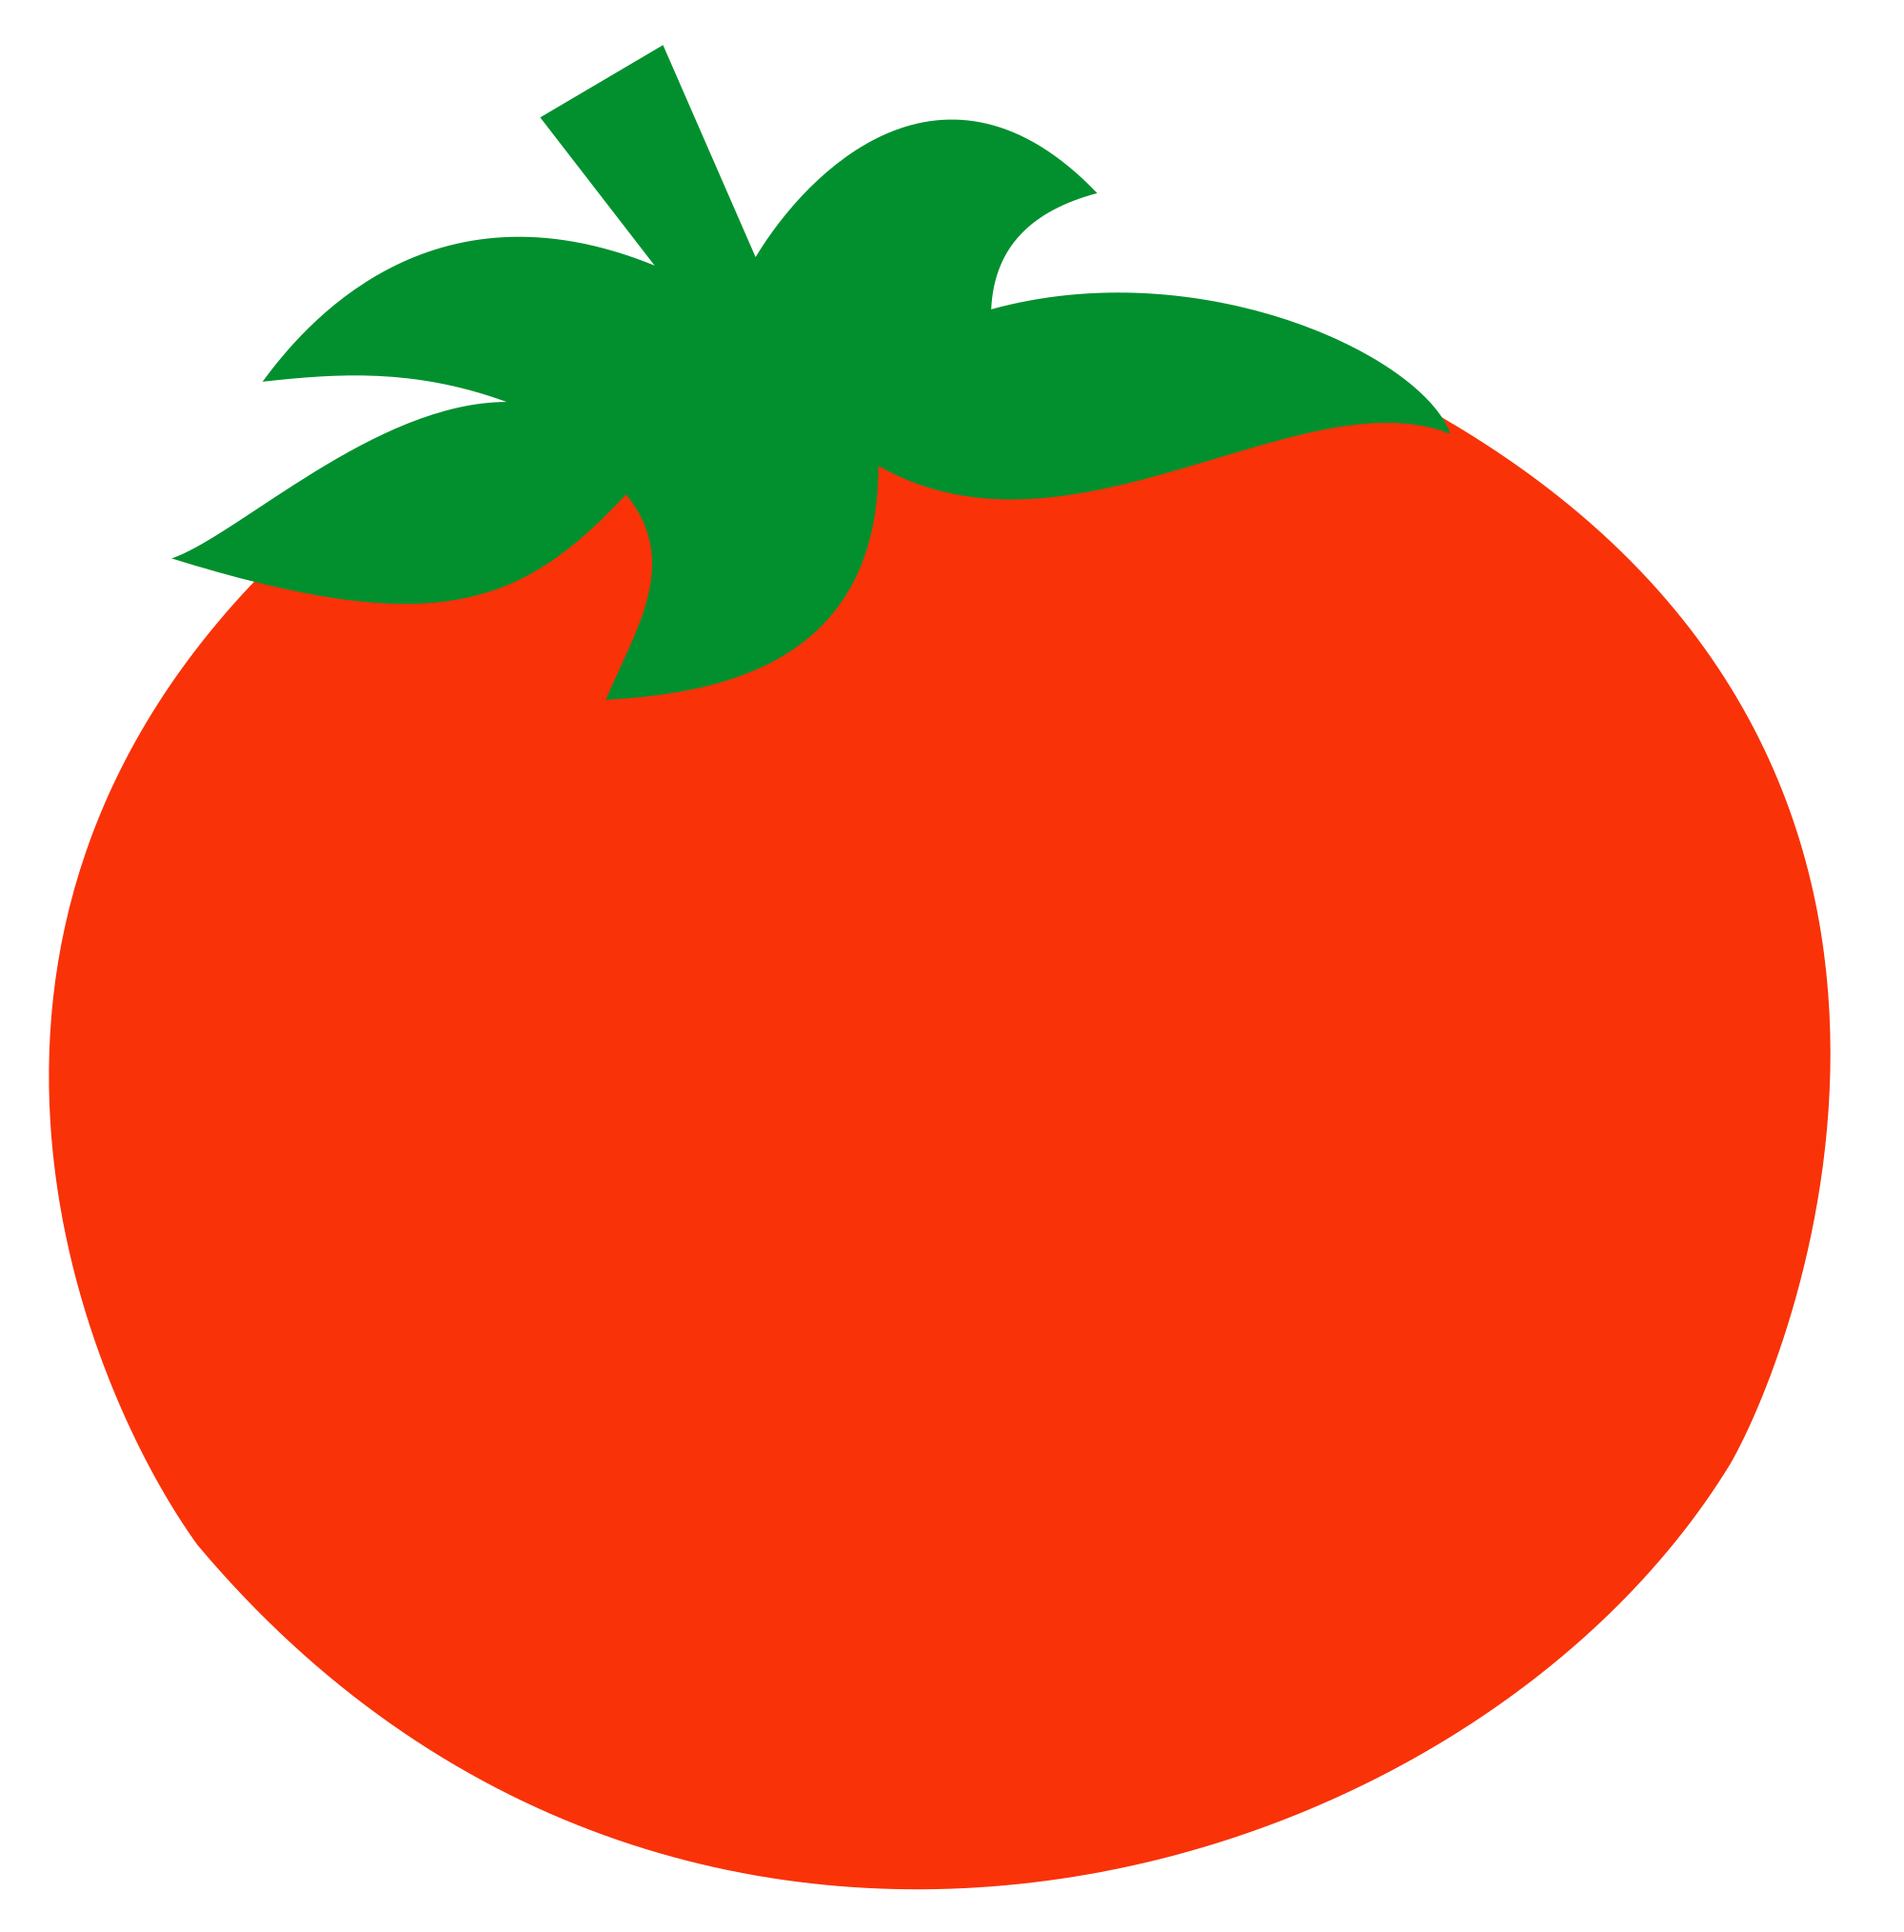 Tomatoes clipart tomato leaf. File rotten svg wikimedia